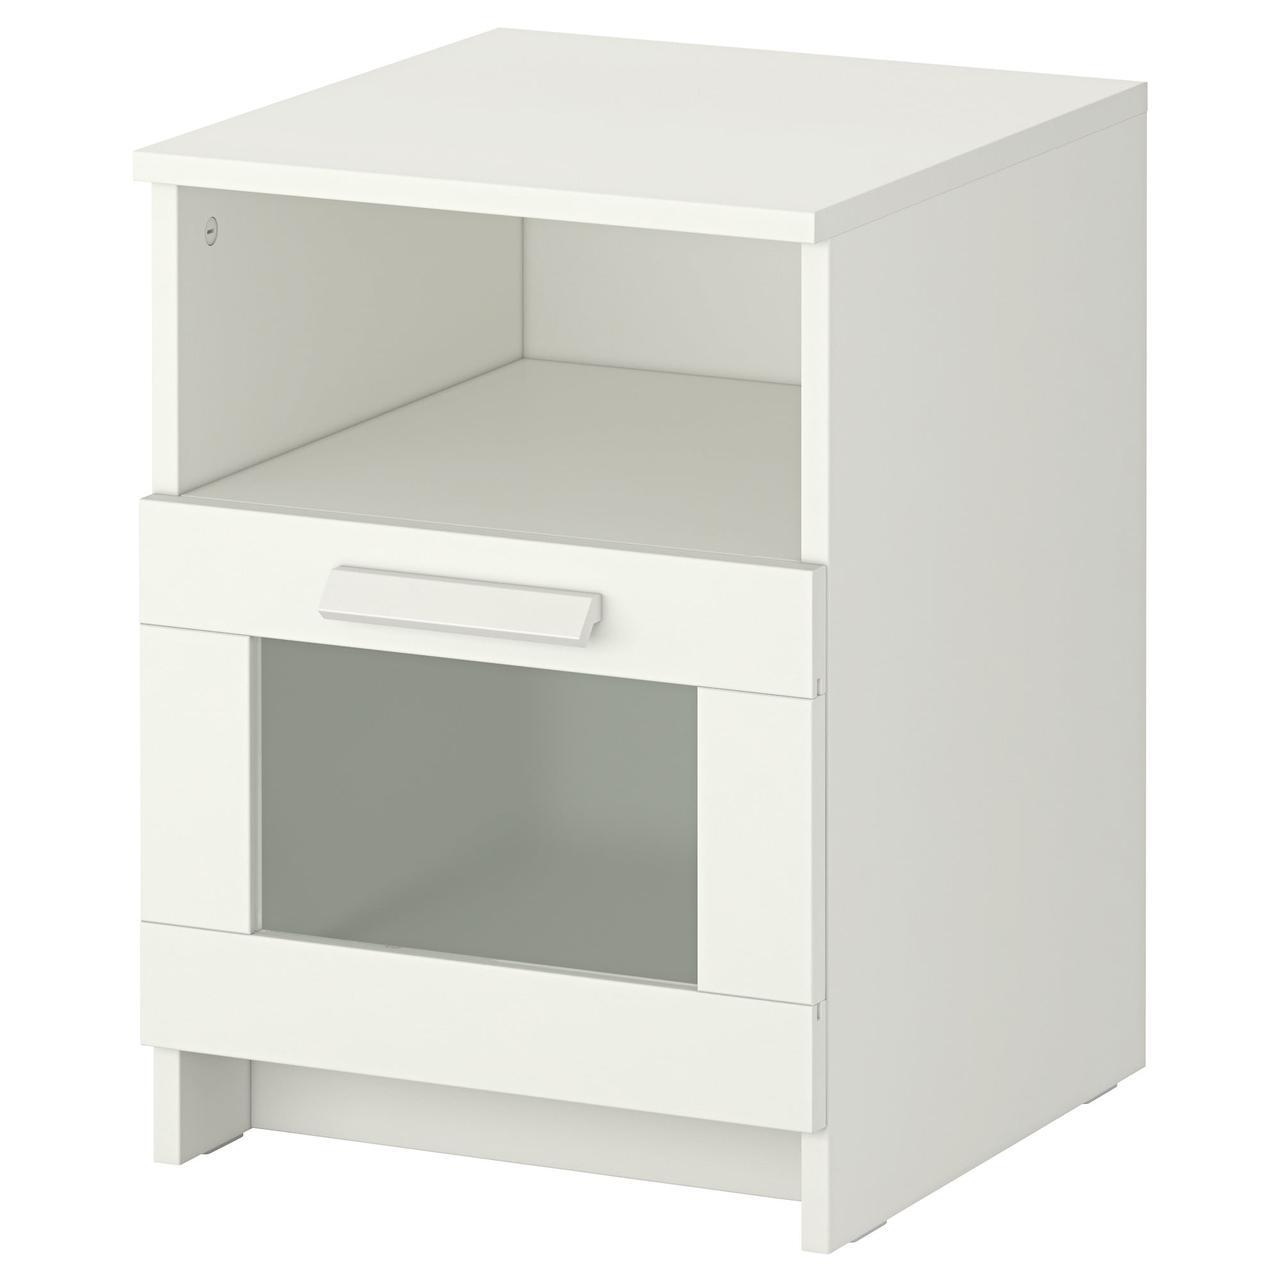 IKEA BRIMNES (102.349.42) Прикроватная тумбочка